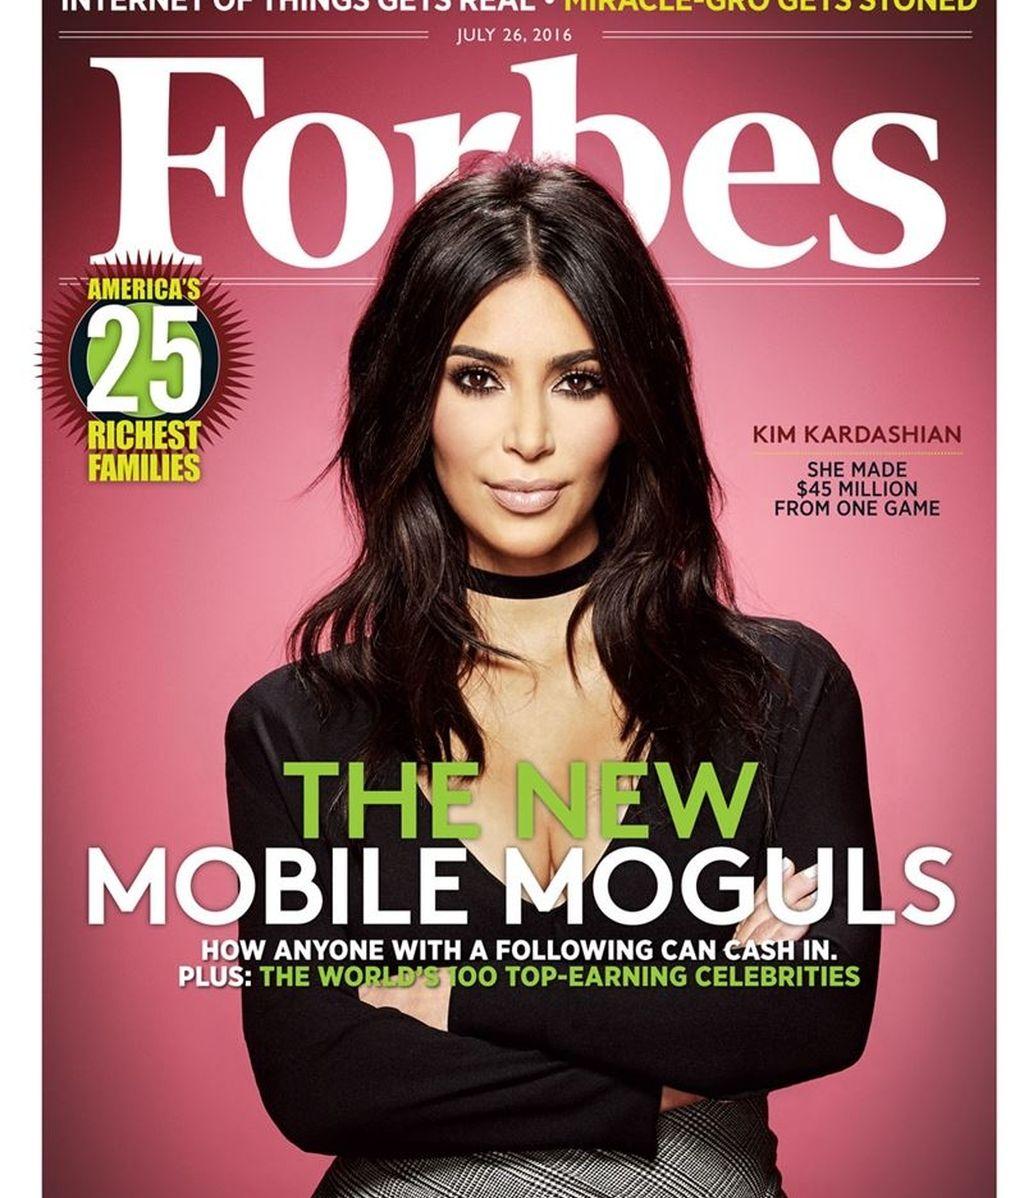 Kim kardashian Forbes